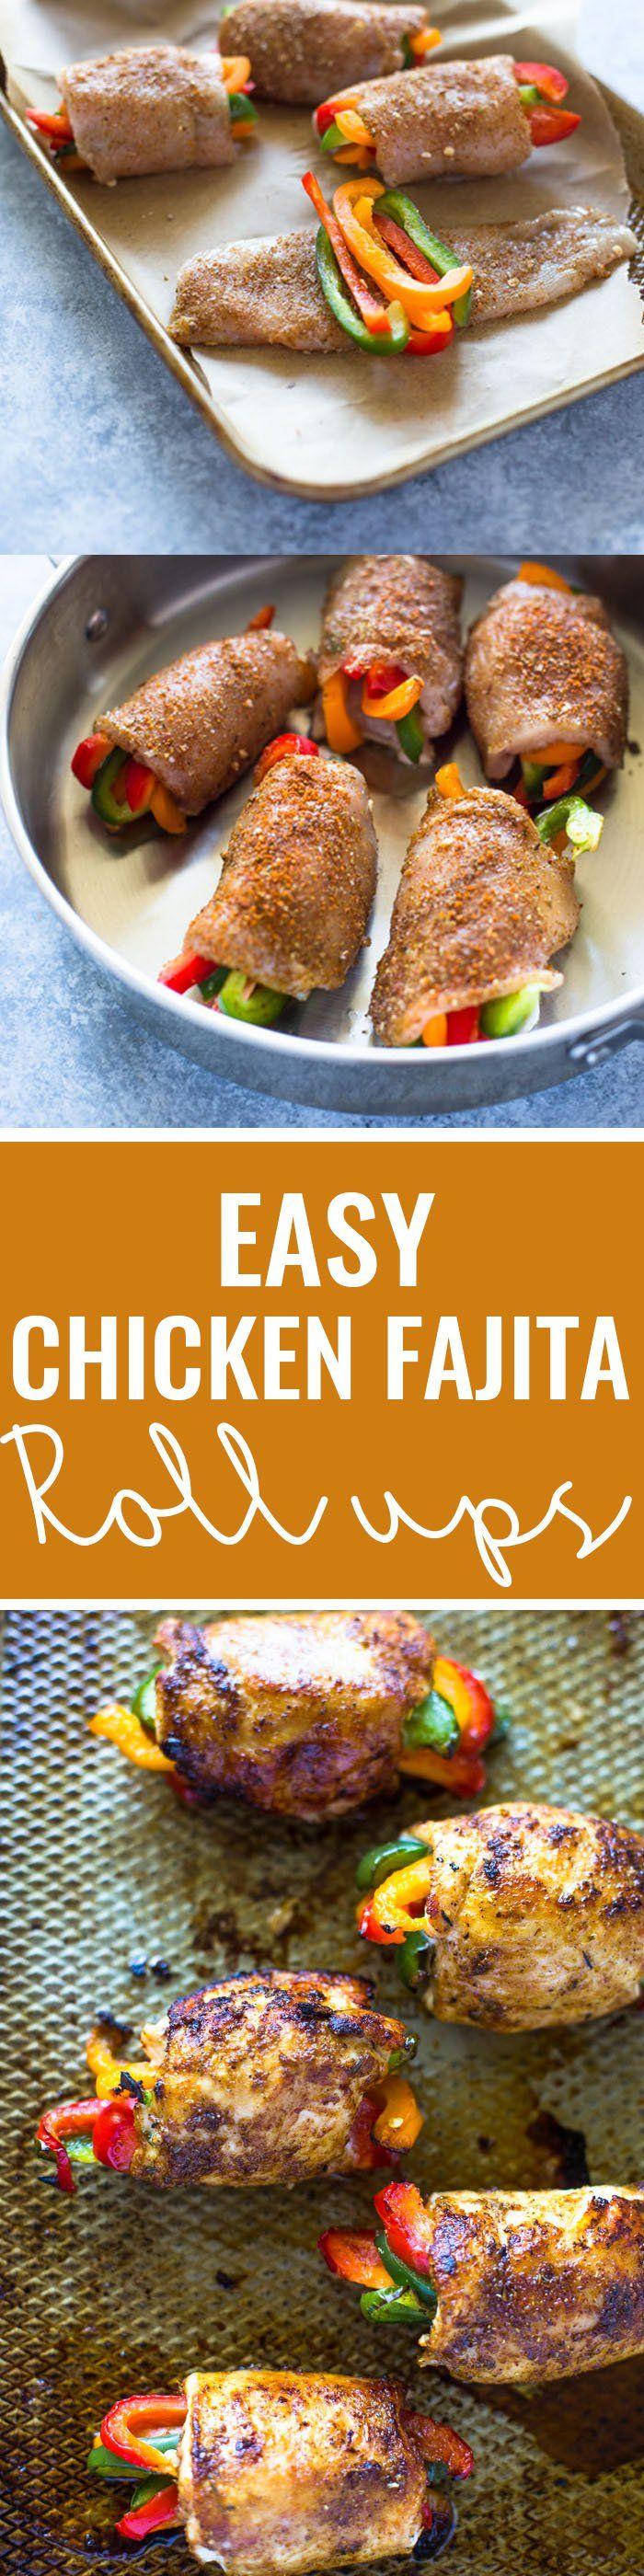 Baked Chicken Fajita Roll-ups | Gimme Delicious